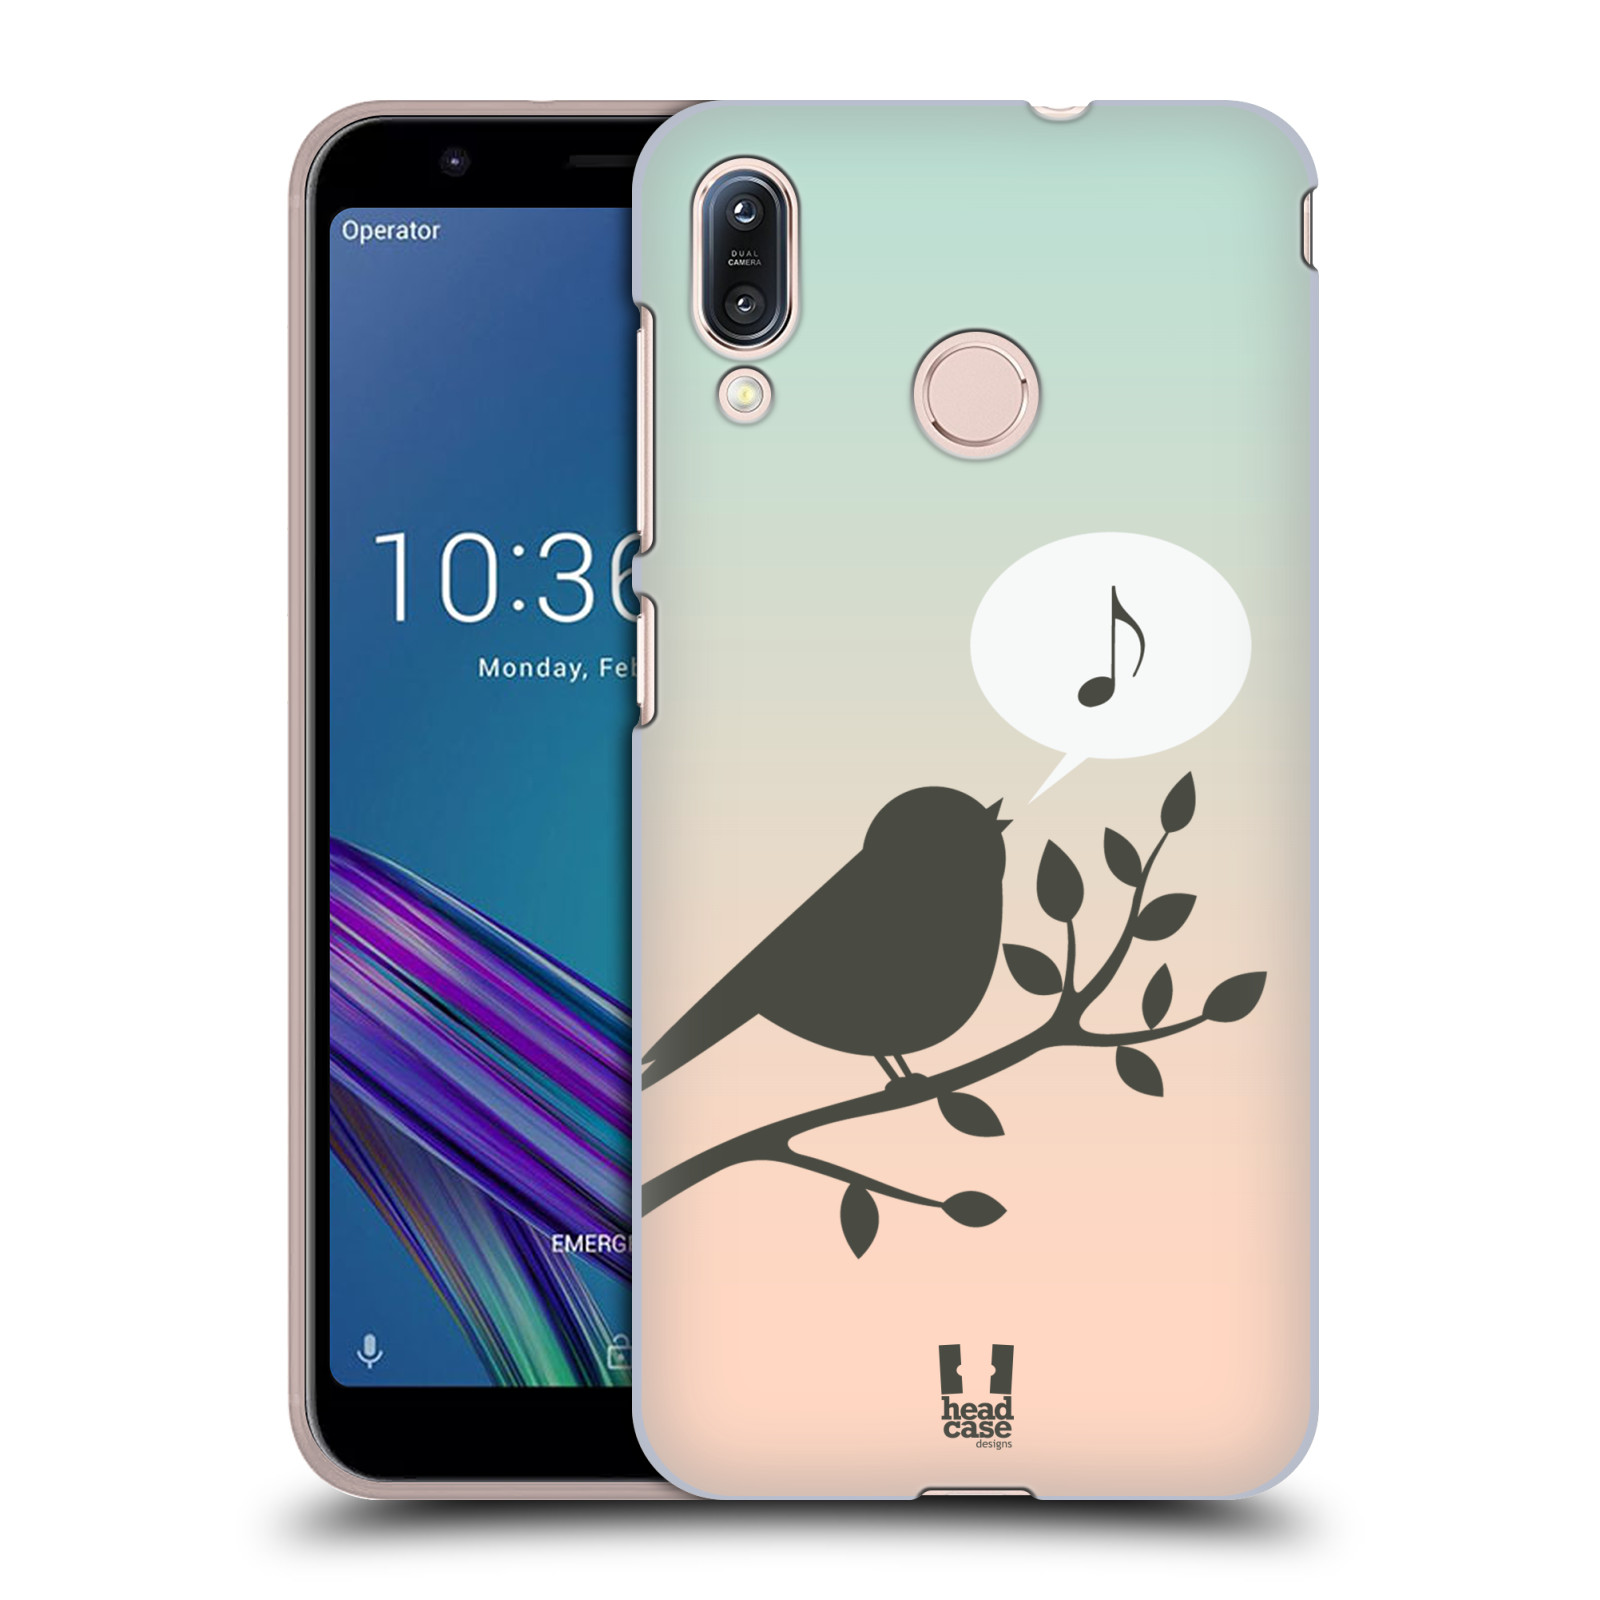 Pouzdro na mobil Asus Zenfone Max M1 (ZB555KL) - HEAD CASE - vzor Ptáček zpěváček noty píseň